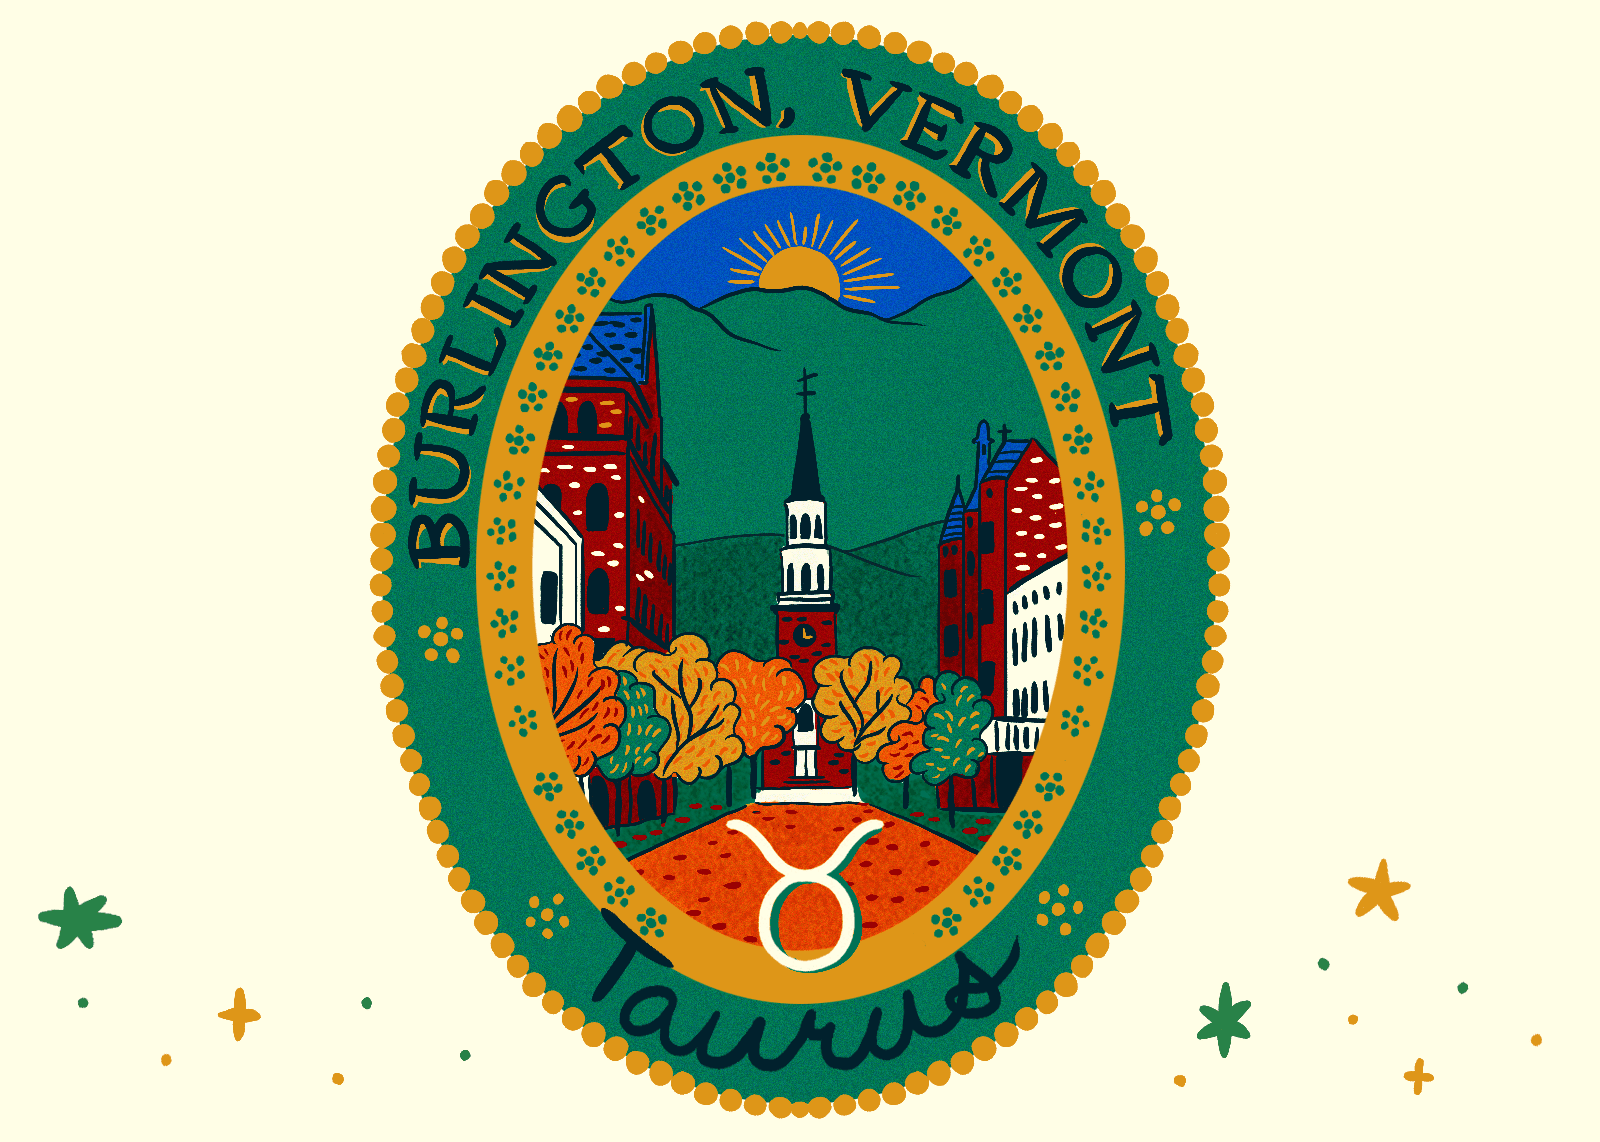 Illustration of Burlington, Vermont